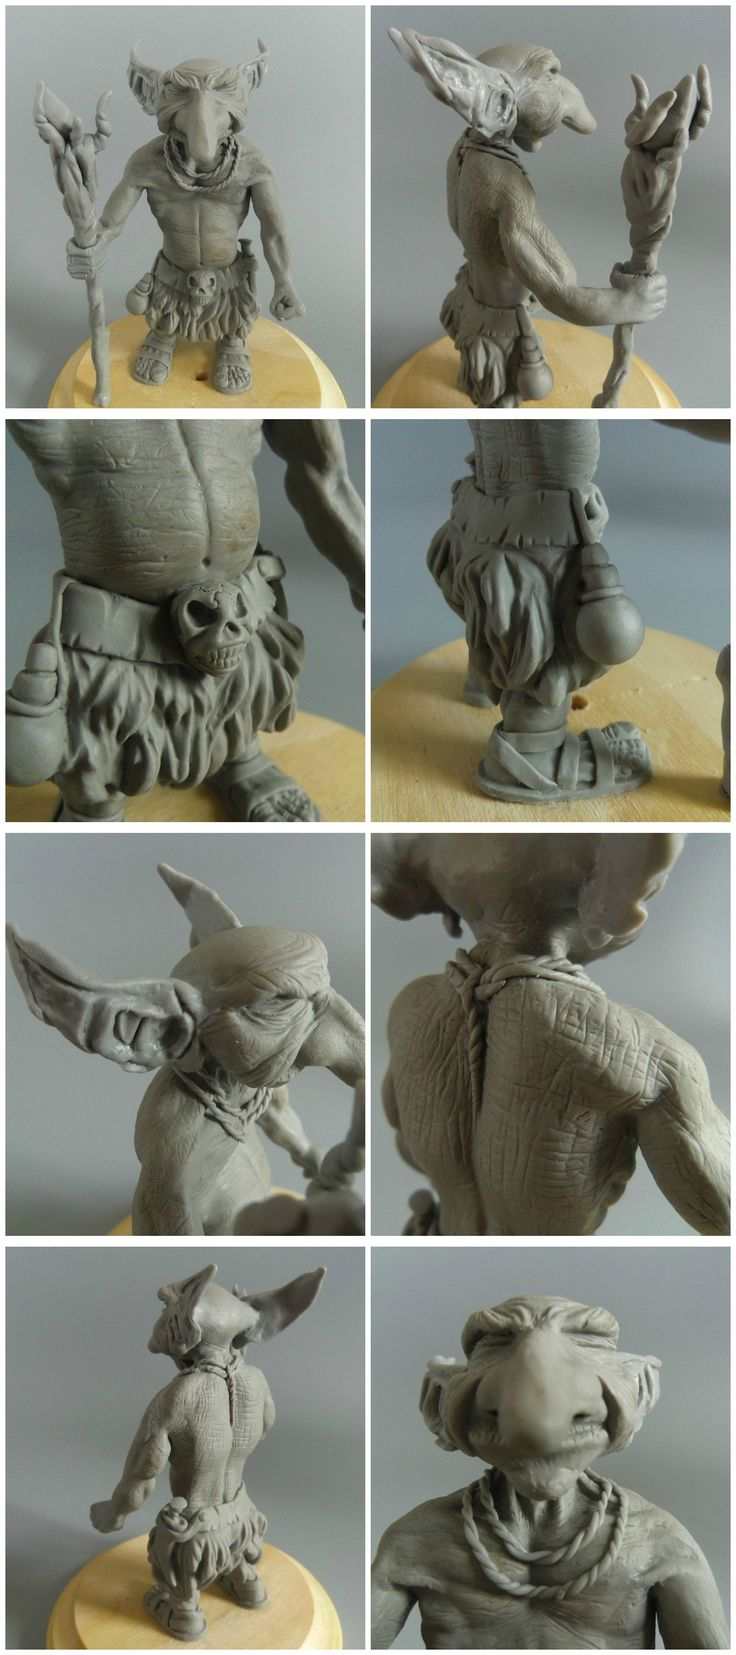 Kixaz the Goblin Shaman